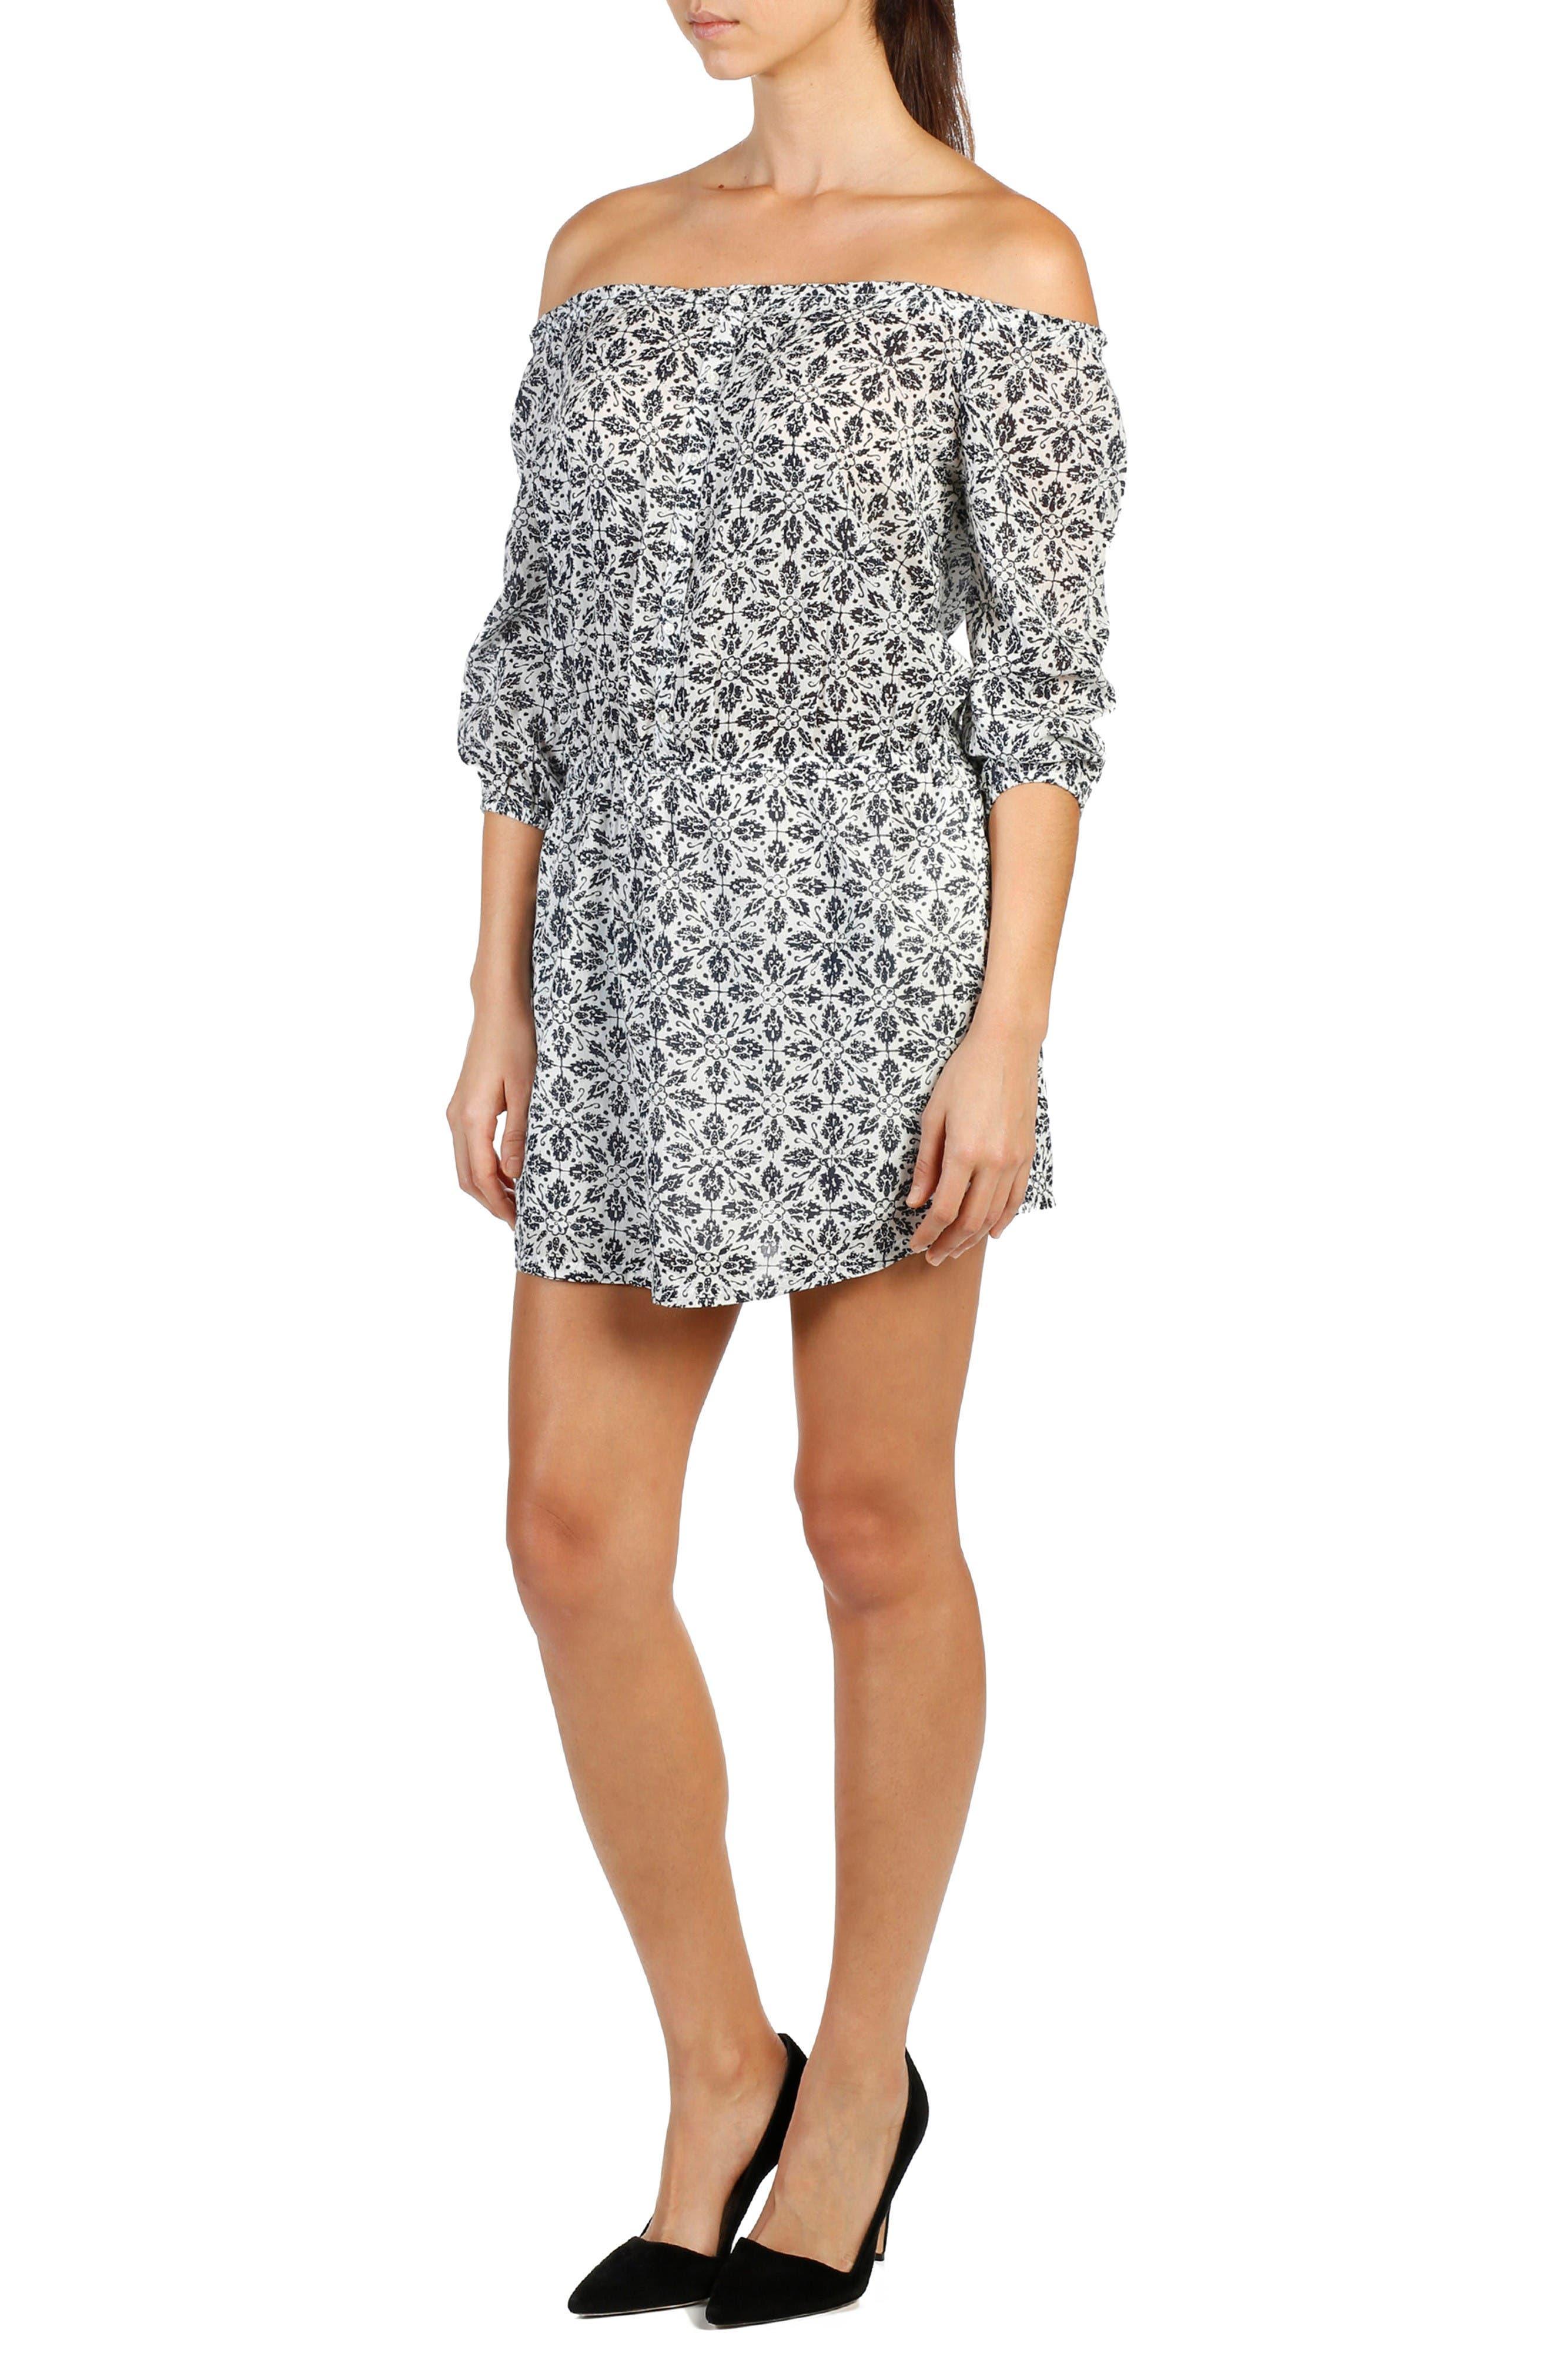 Clover Cotton Off the Shoulder Dress,                         Main,                         color, Pristine/ Peacoat